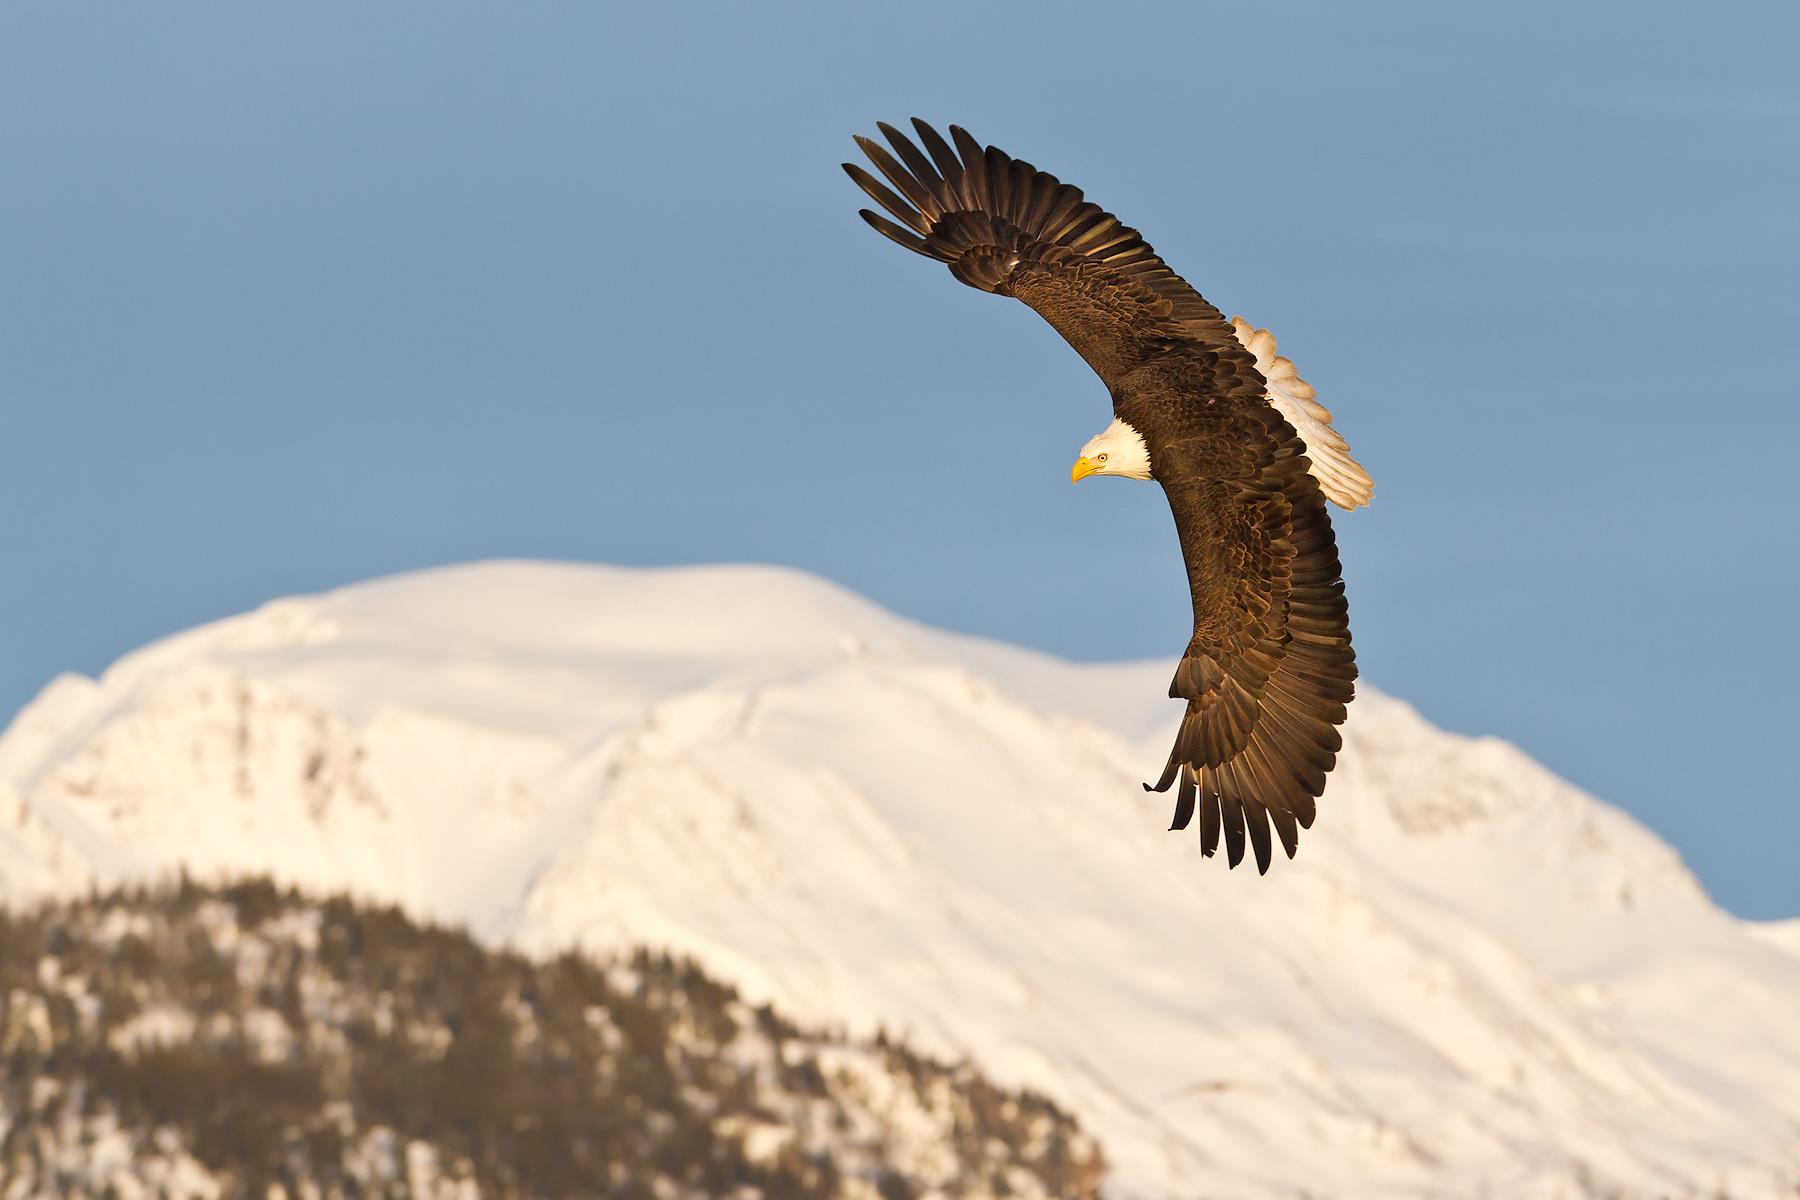 Bald-eagle-banking-with-with-mountain-bkgd-E07G2711-Kachemak-Bay,-Homer,-AK.jpg